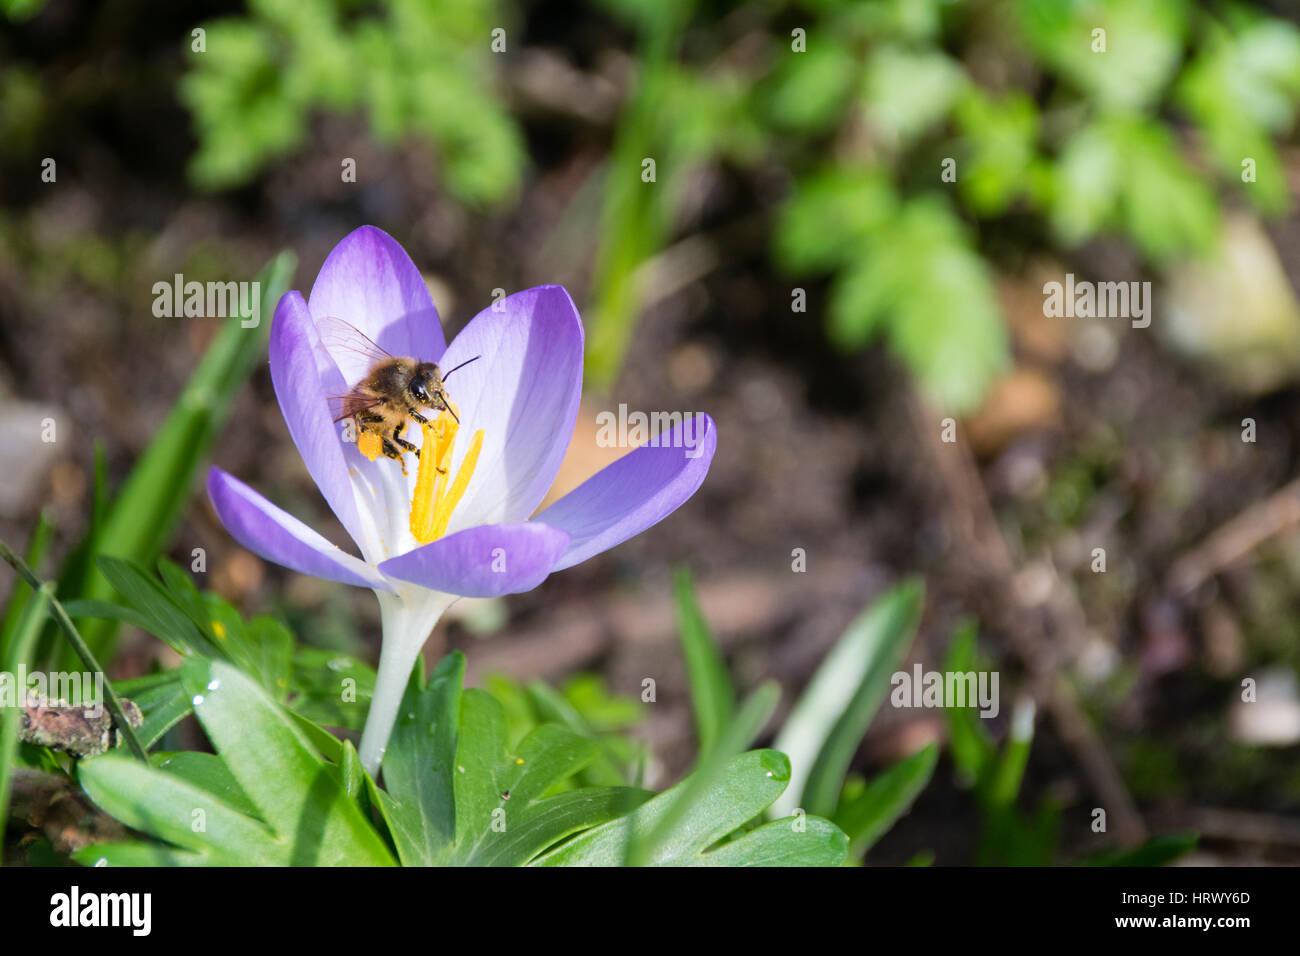 Spring Flowers For Bees Gallery Fresh Lotus Flowers